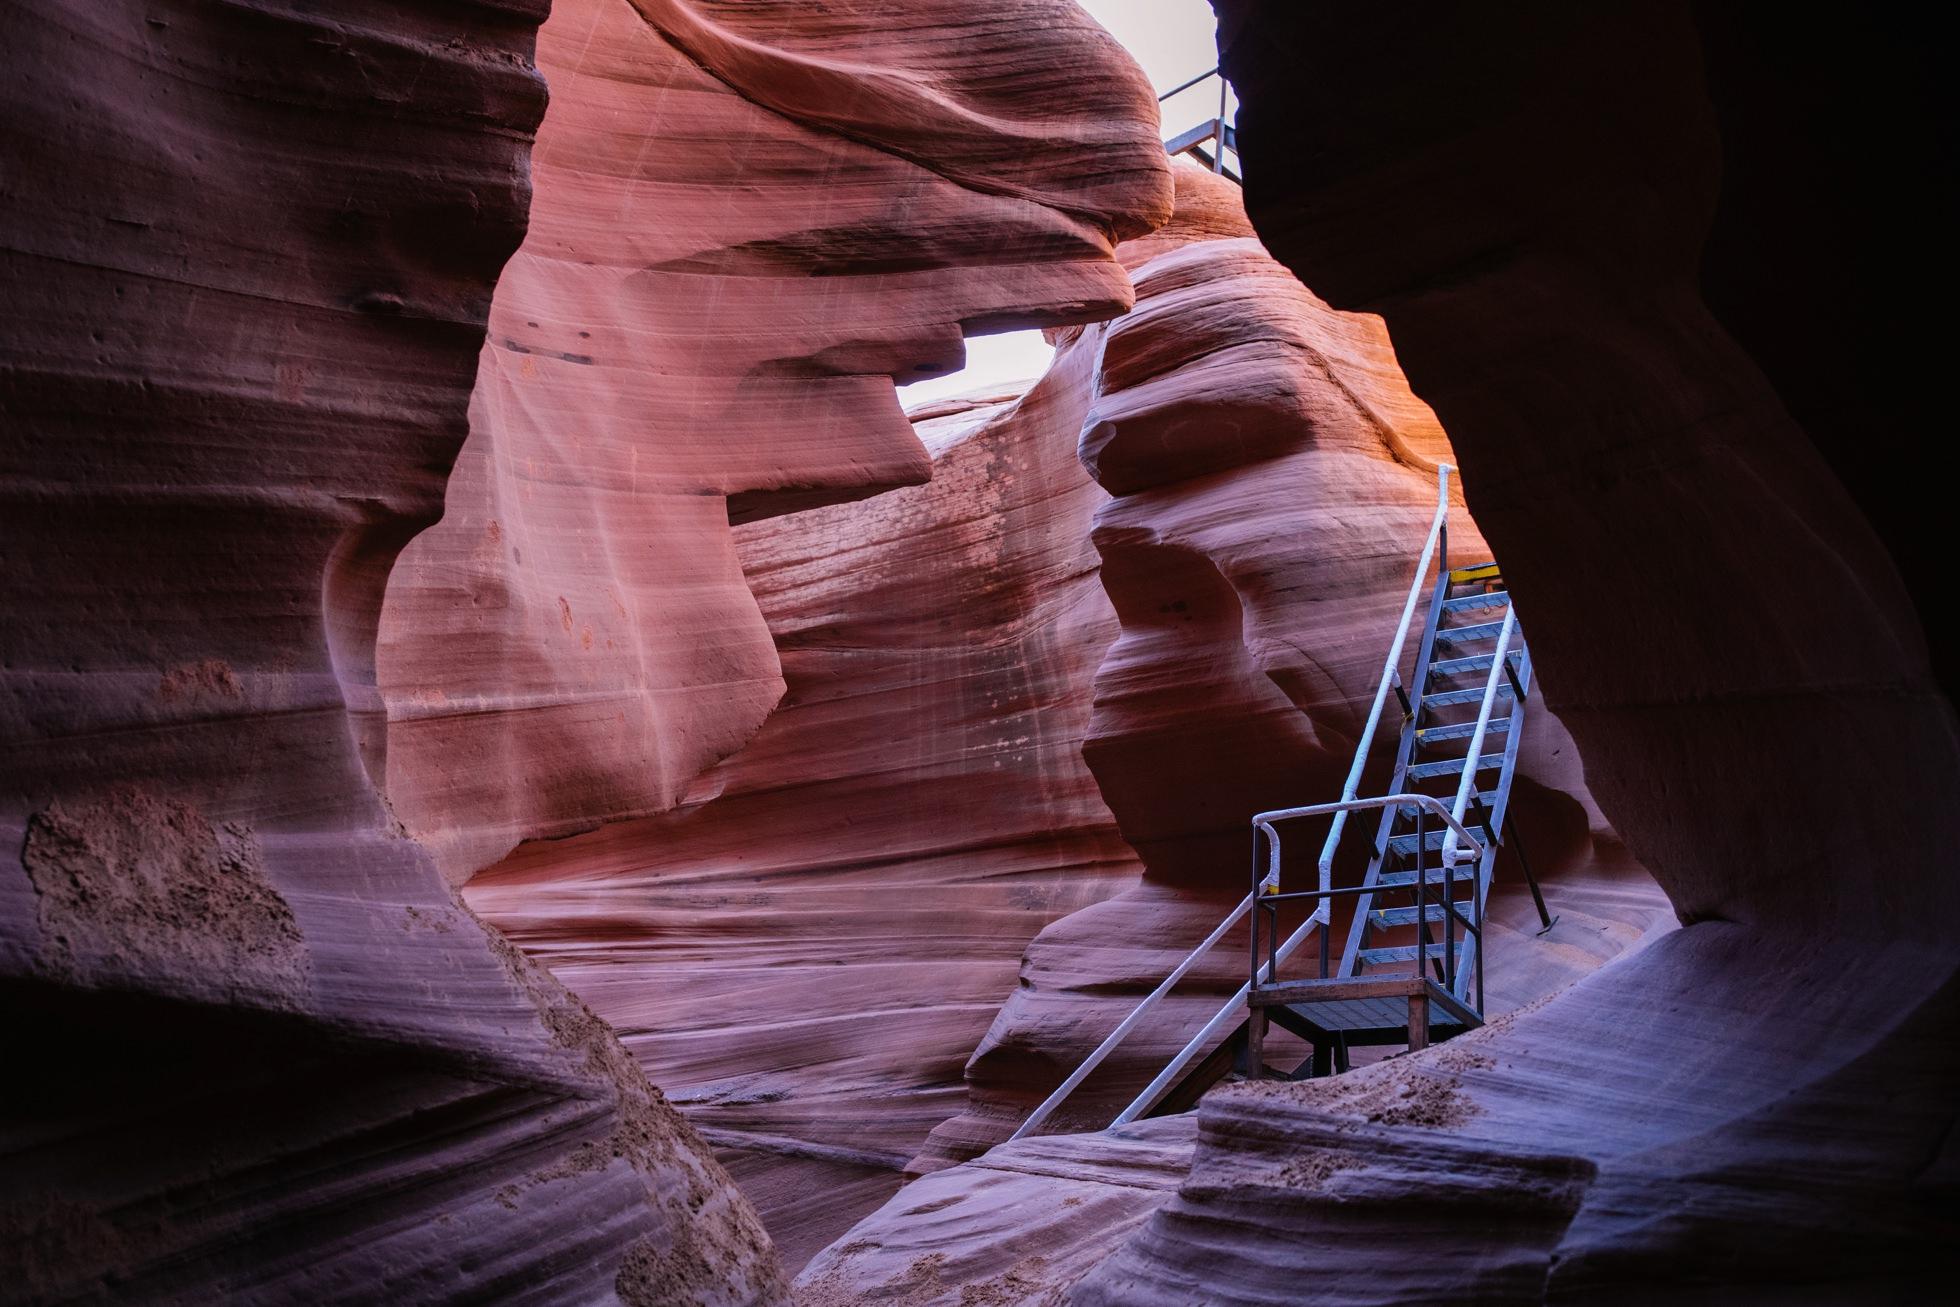 0115-lower-antelope-canyon-photography-slot-canyon-winter